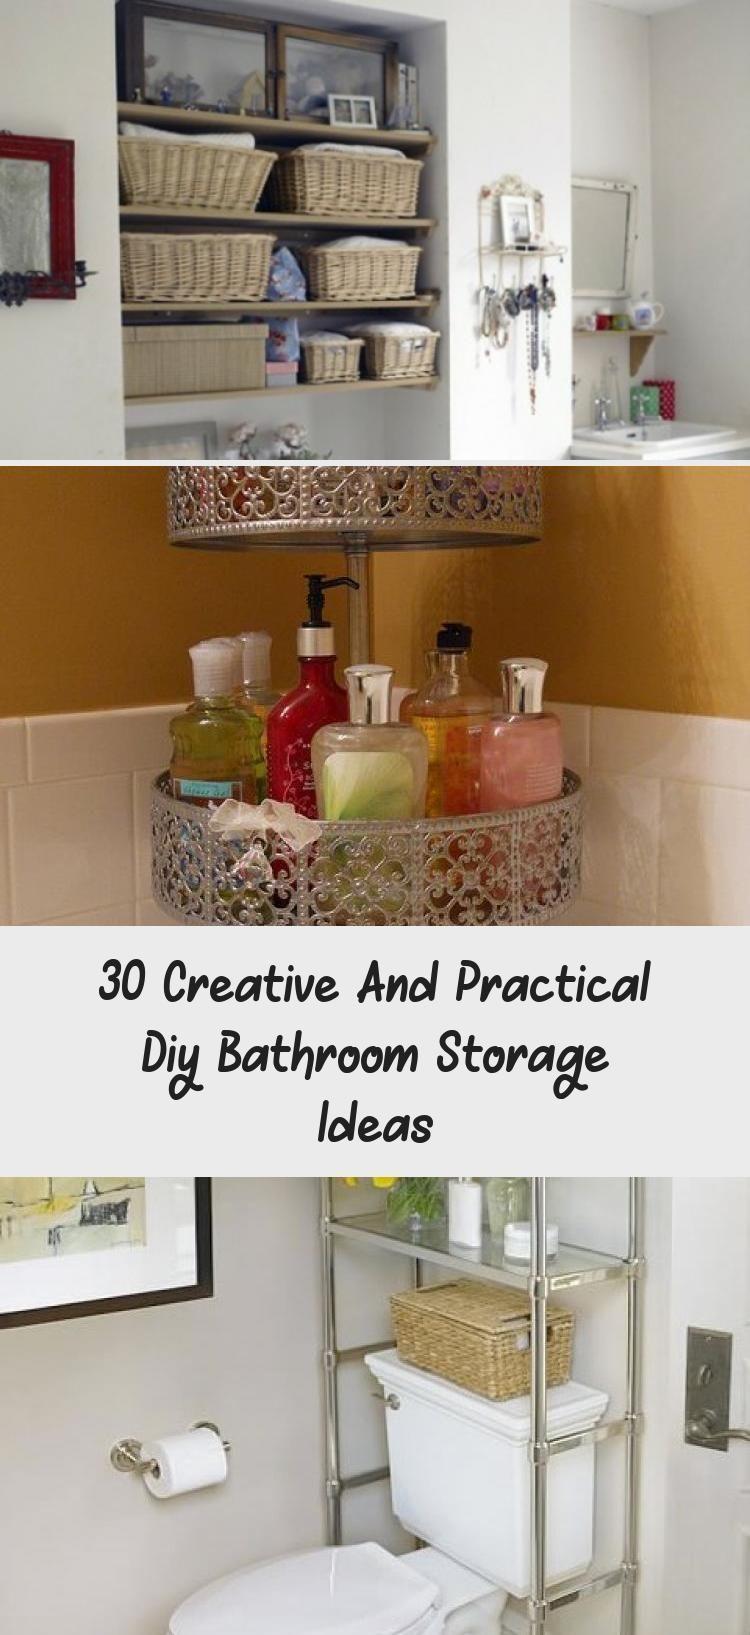 30 Creative And Practical Diy Bathroom Storage Ideas Bathroom